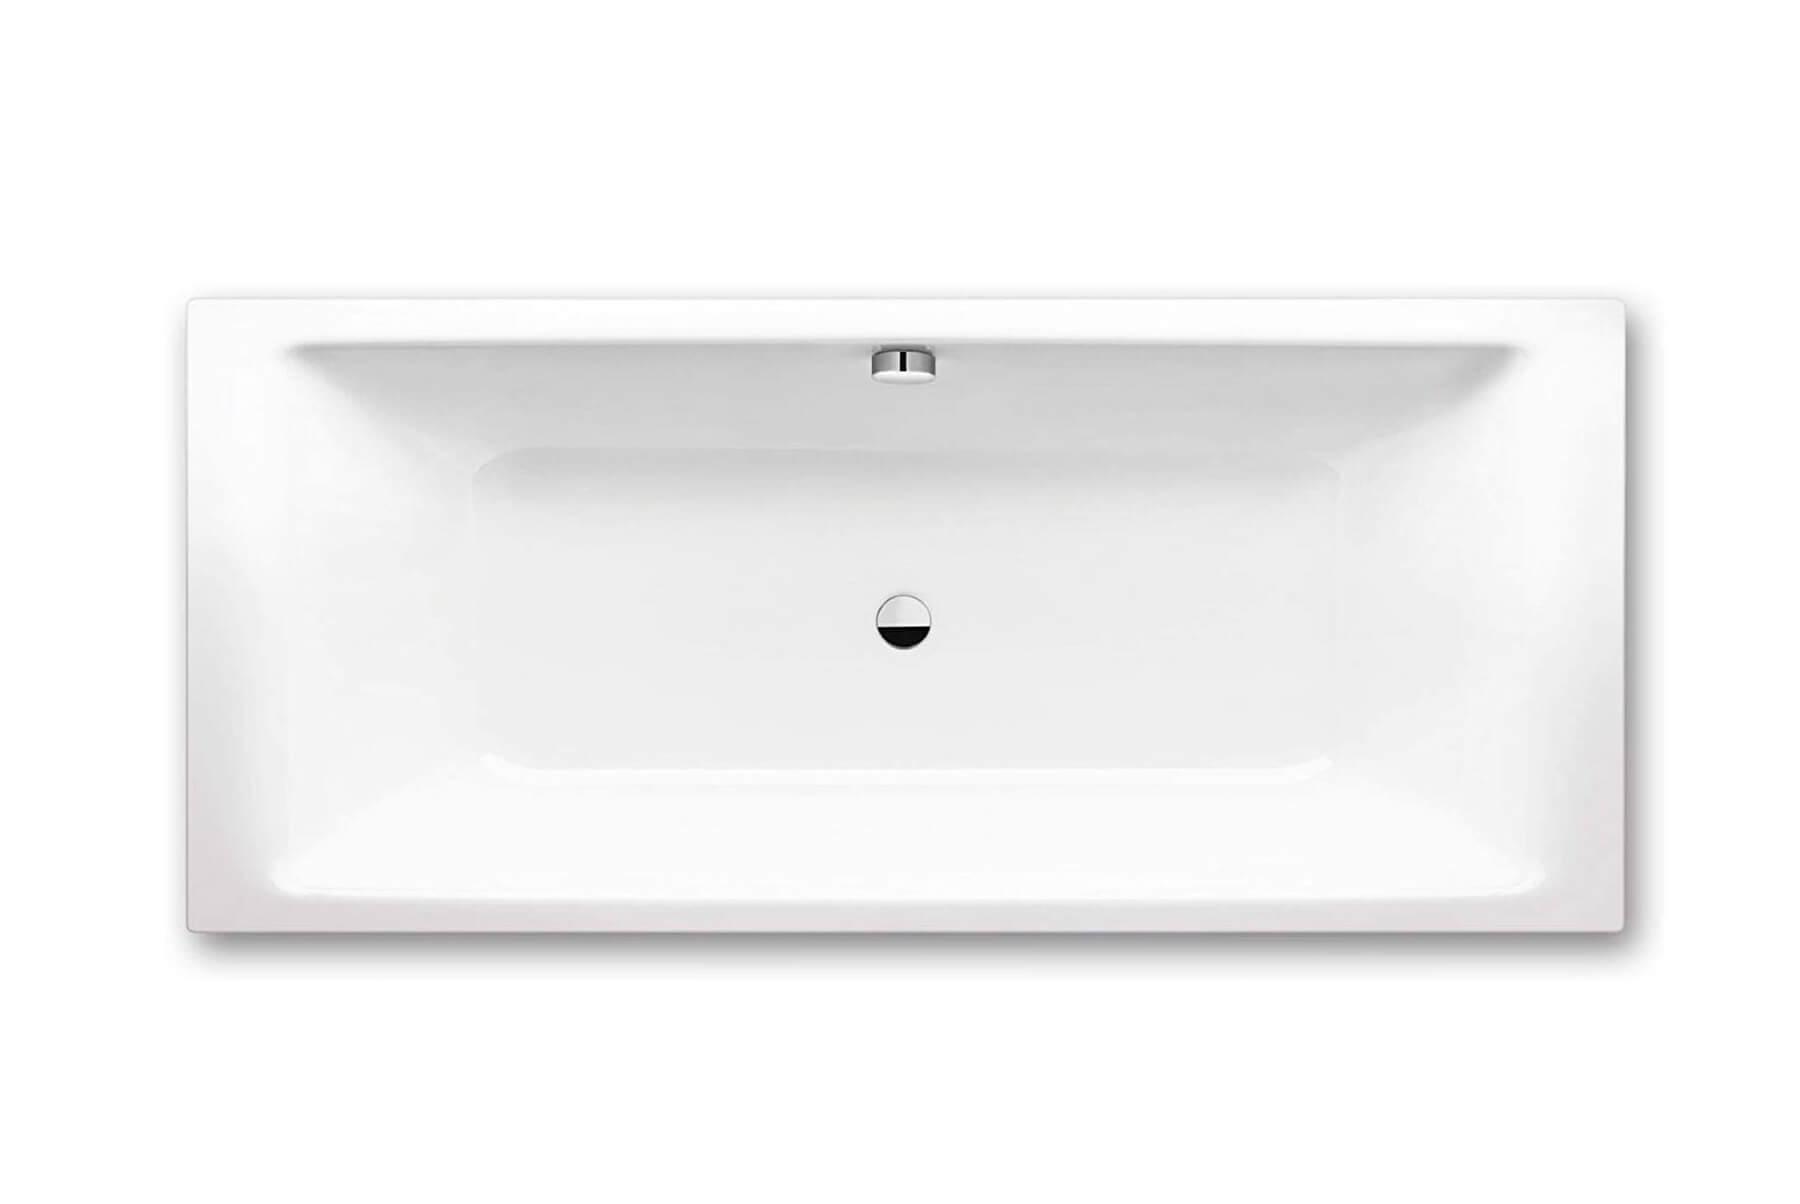 Bath-Tubs-Kaldewei-Puro-Duo-White-1800x1204